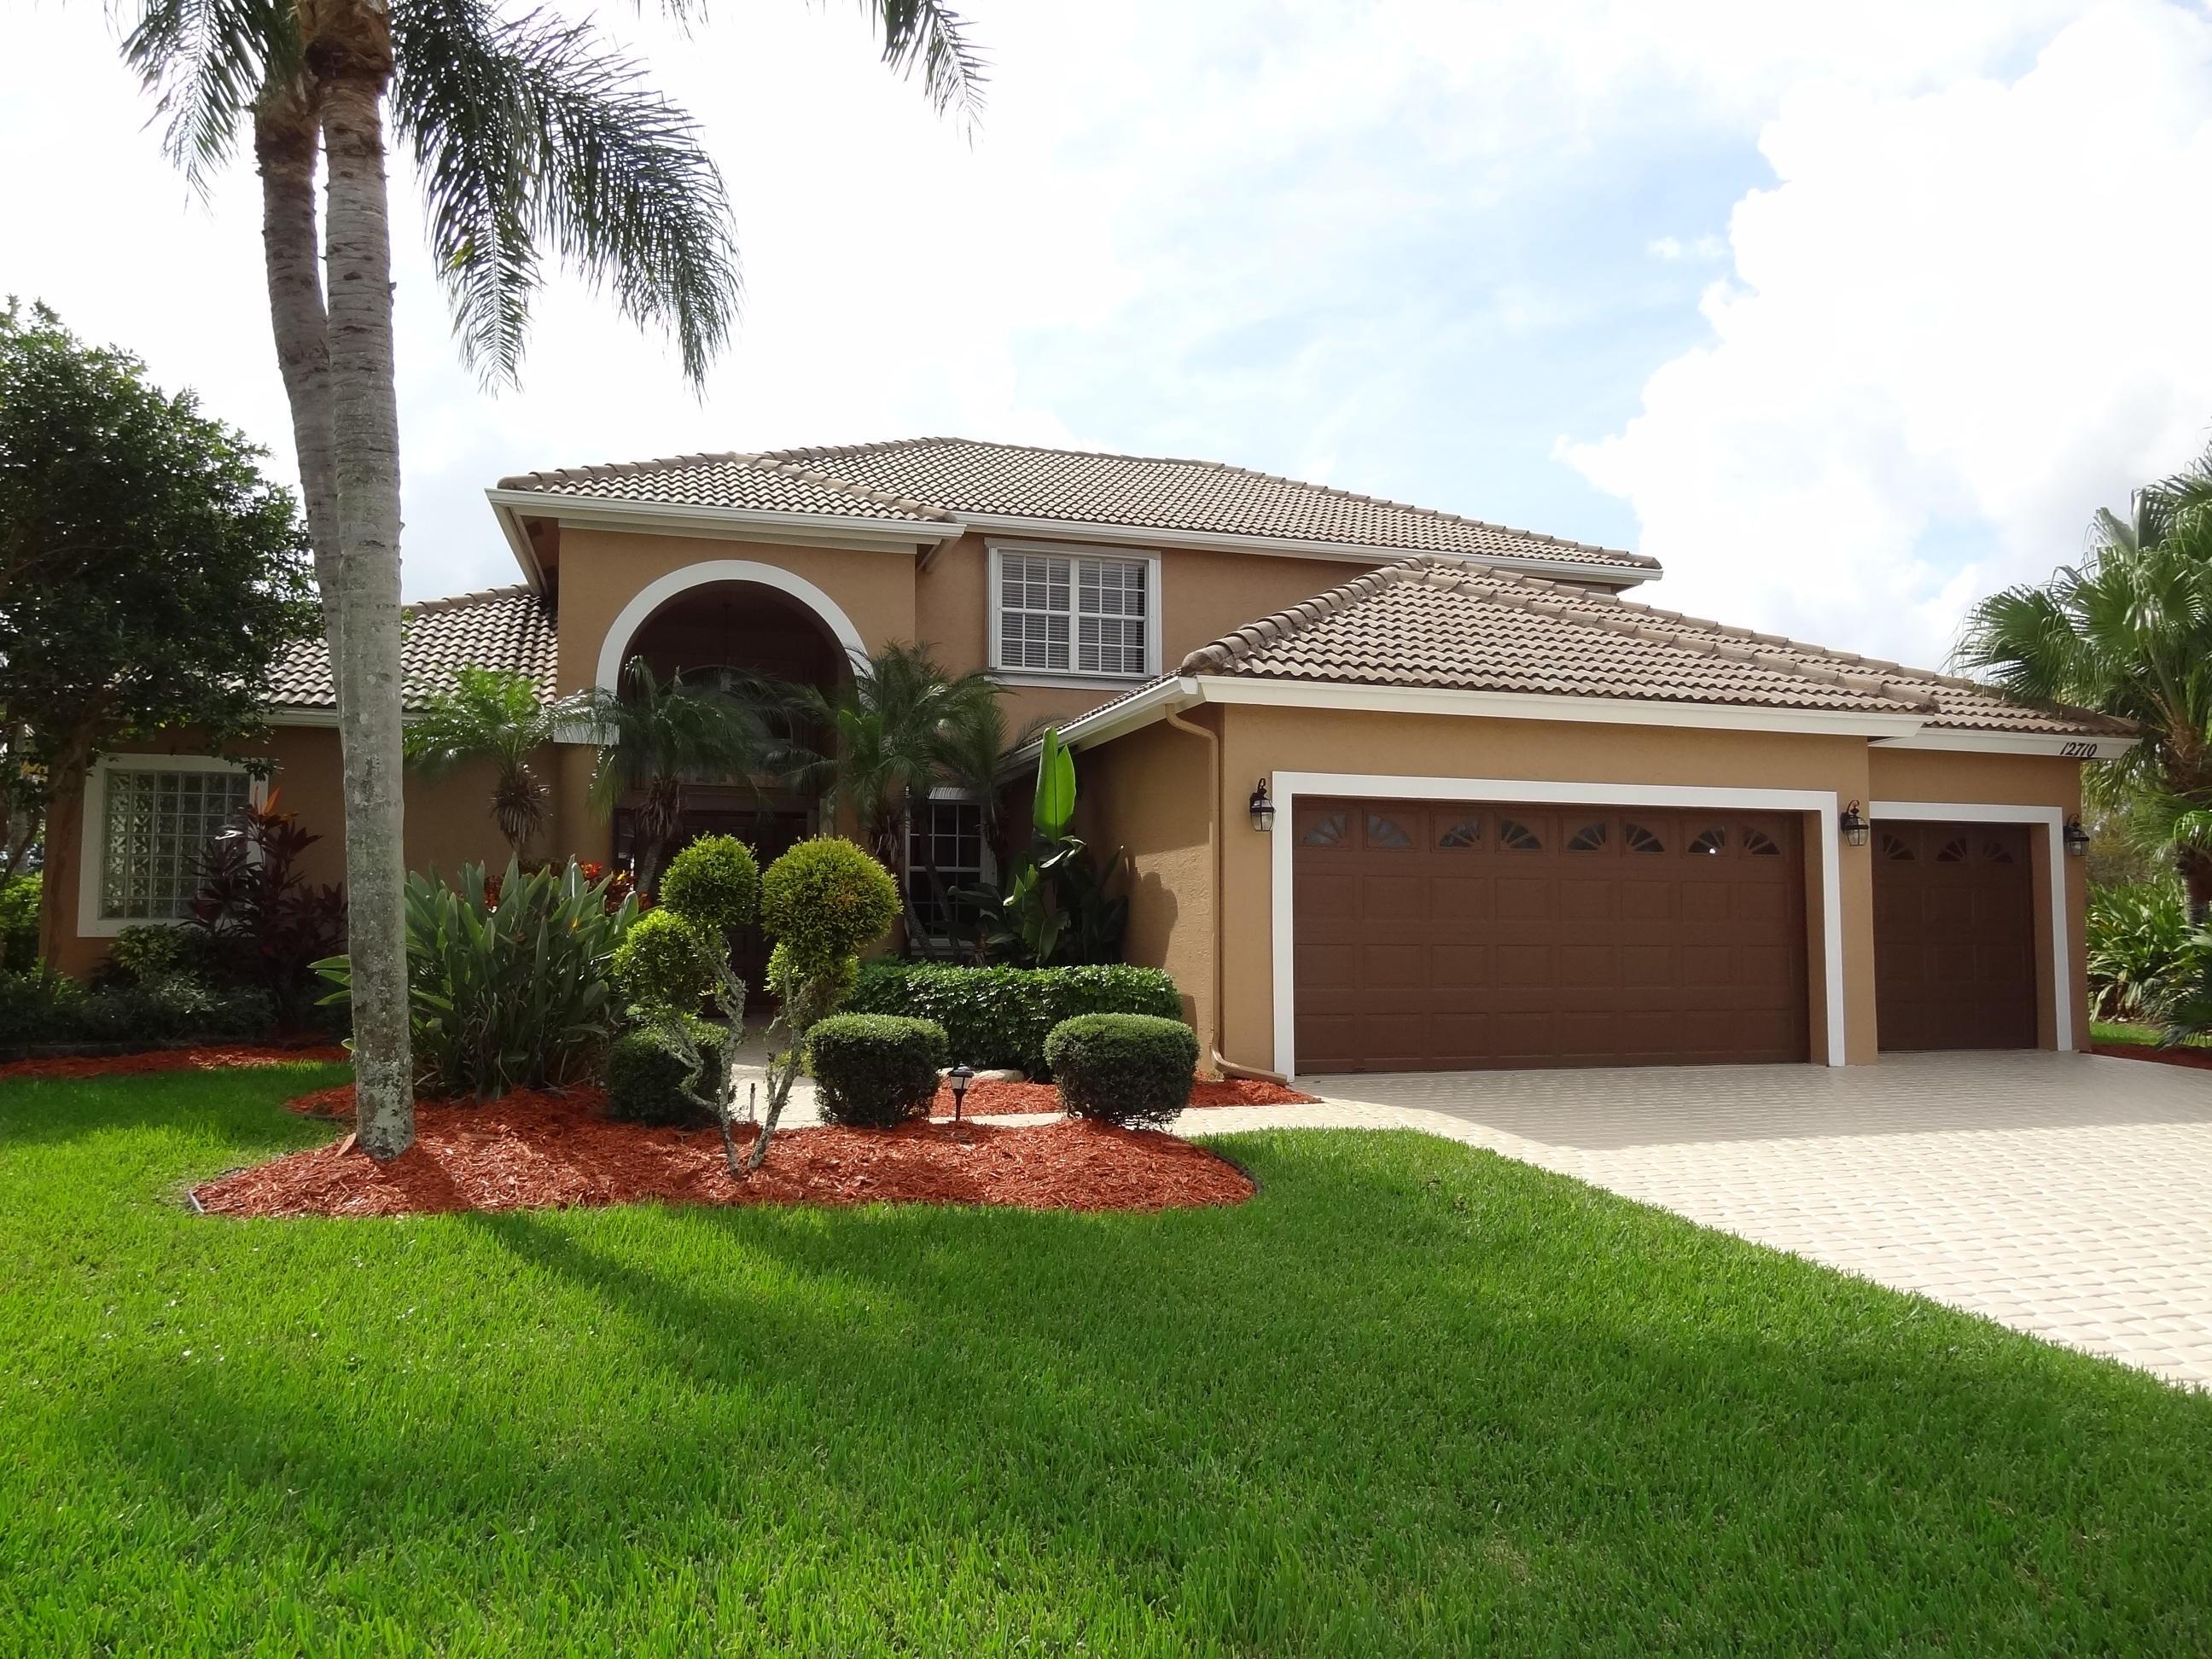 Photo of  Boca Raton, FL 33428 MLS RX-10478200